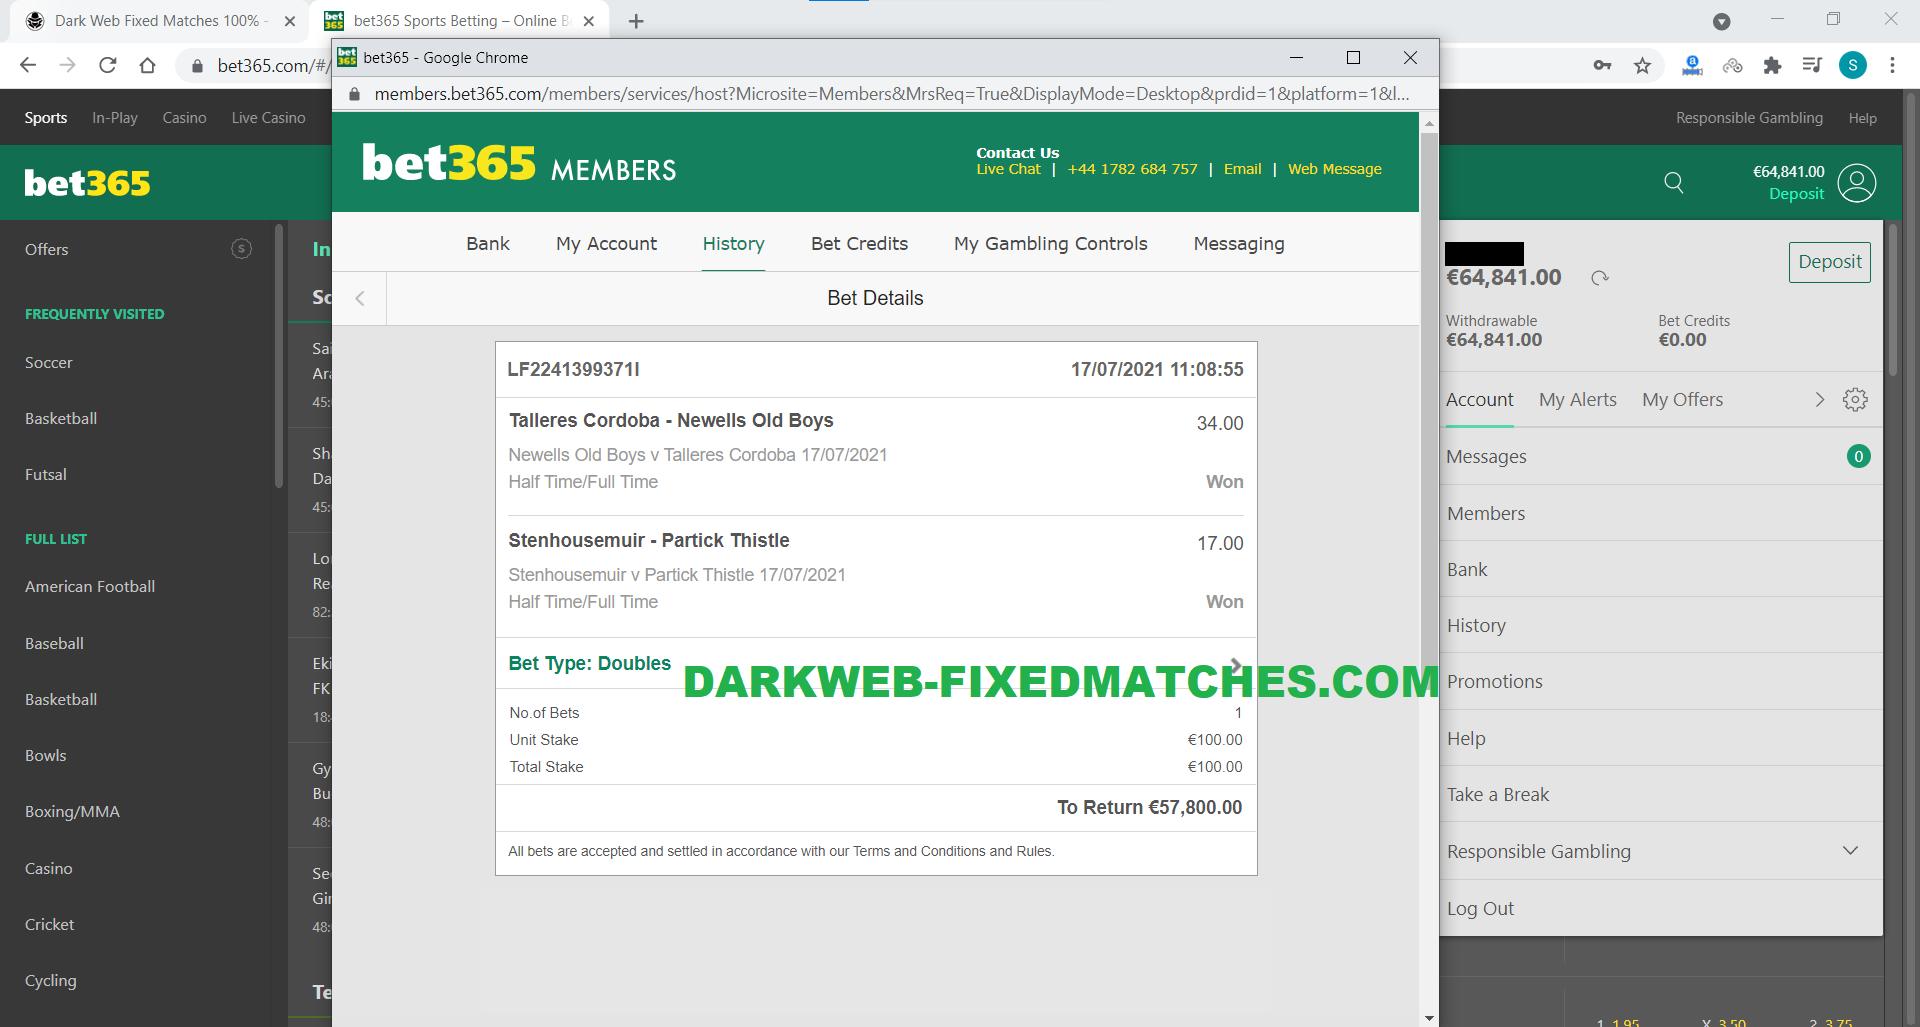 Fixed websites free match Free football